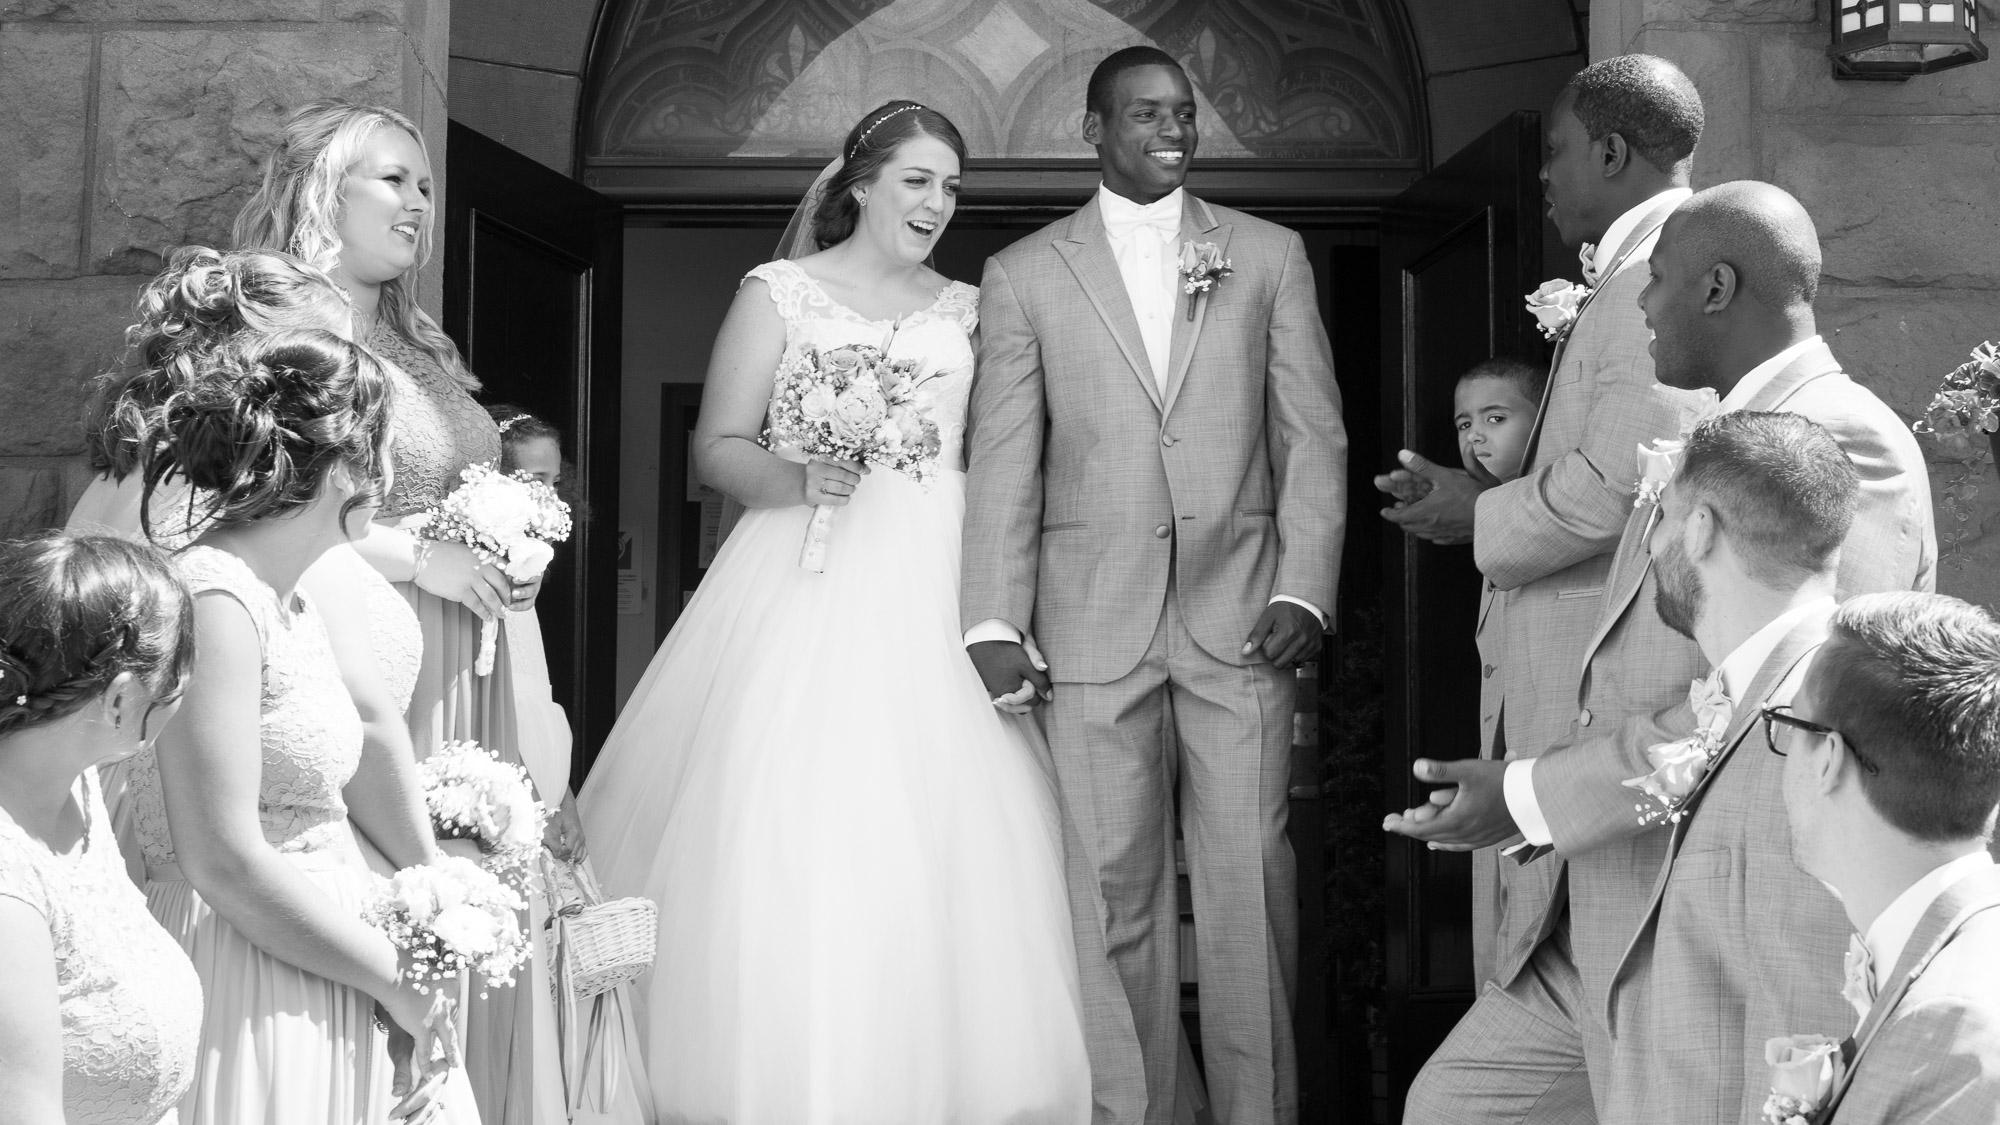 Bride_and_Groom_Wedding_Ceremony-4.jpg